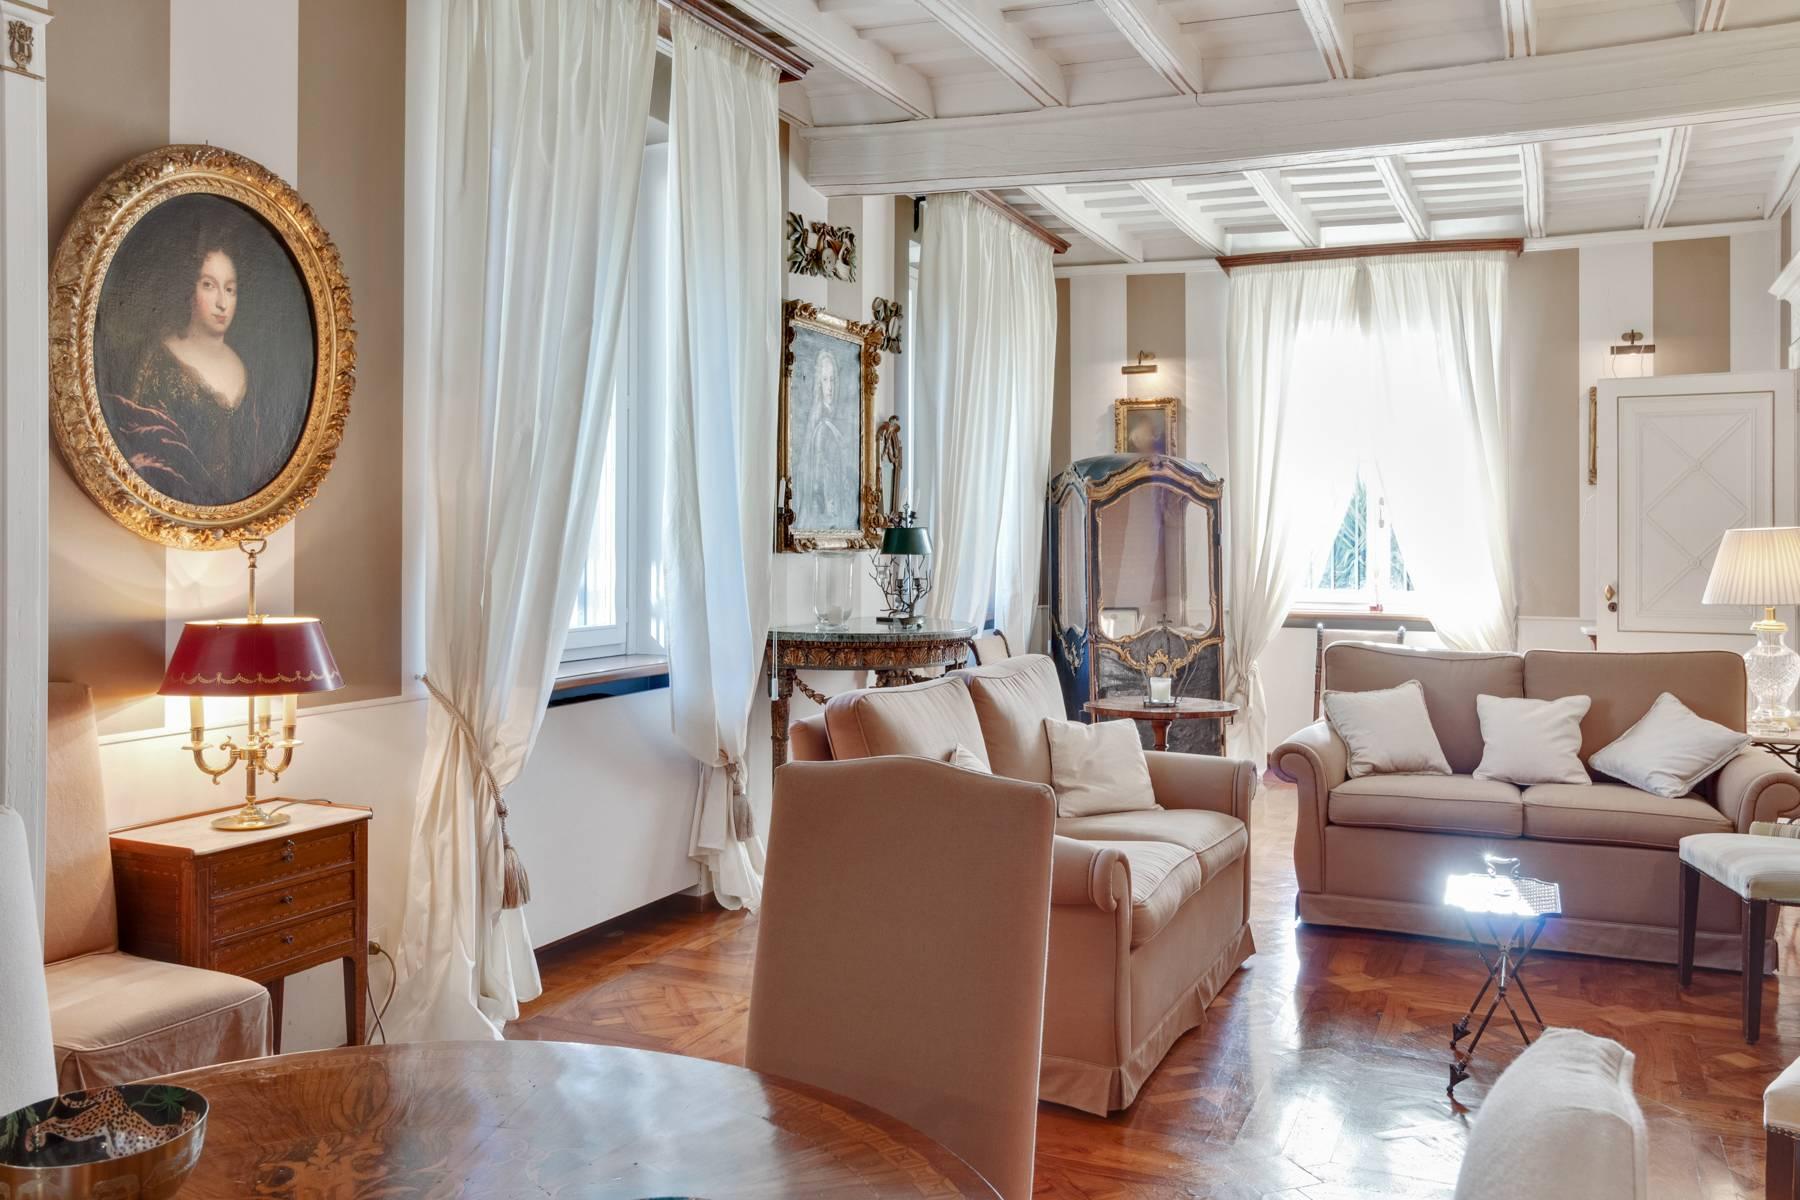 Casa indipendente in Vendita a Torino: 5 locali, 270 mq - Foto 10